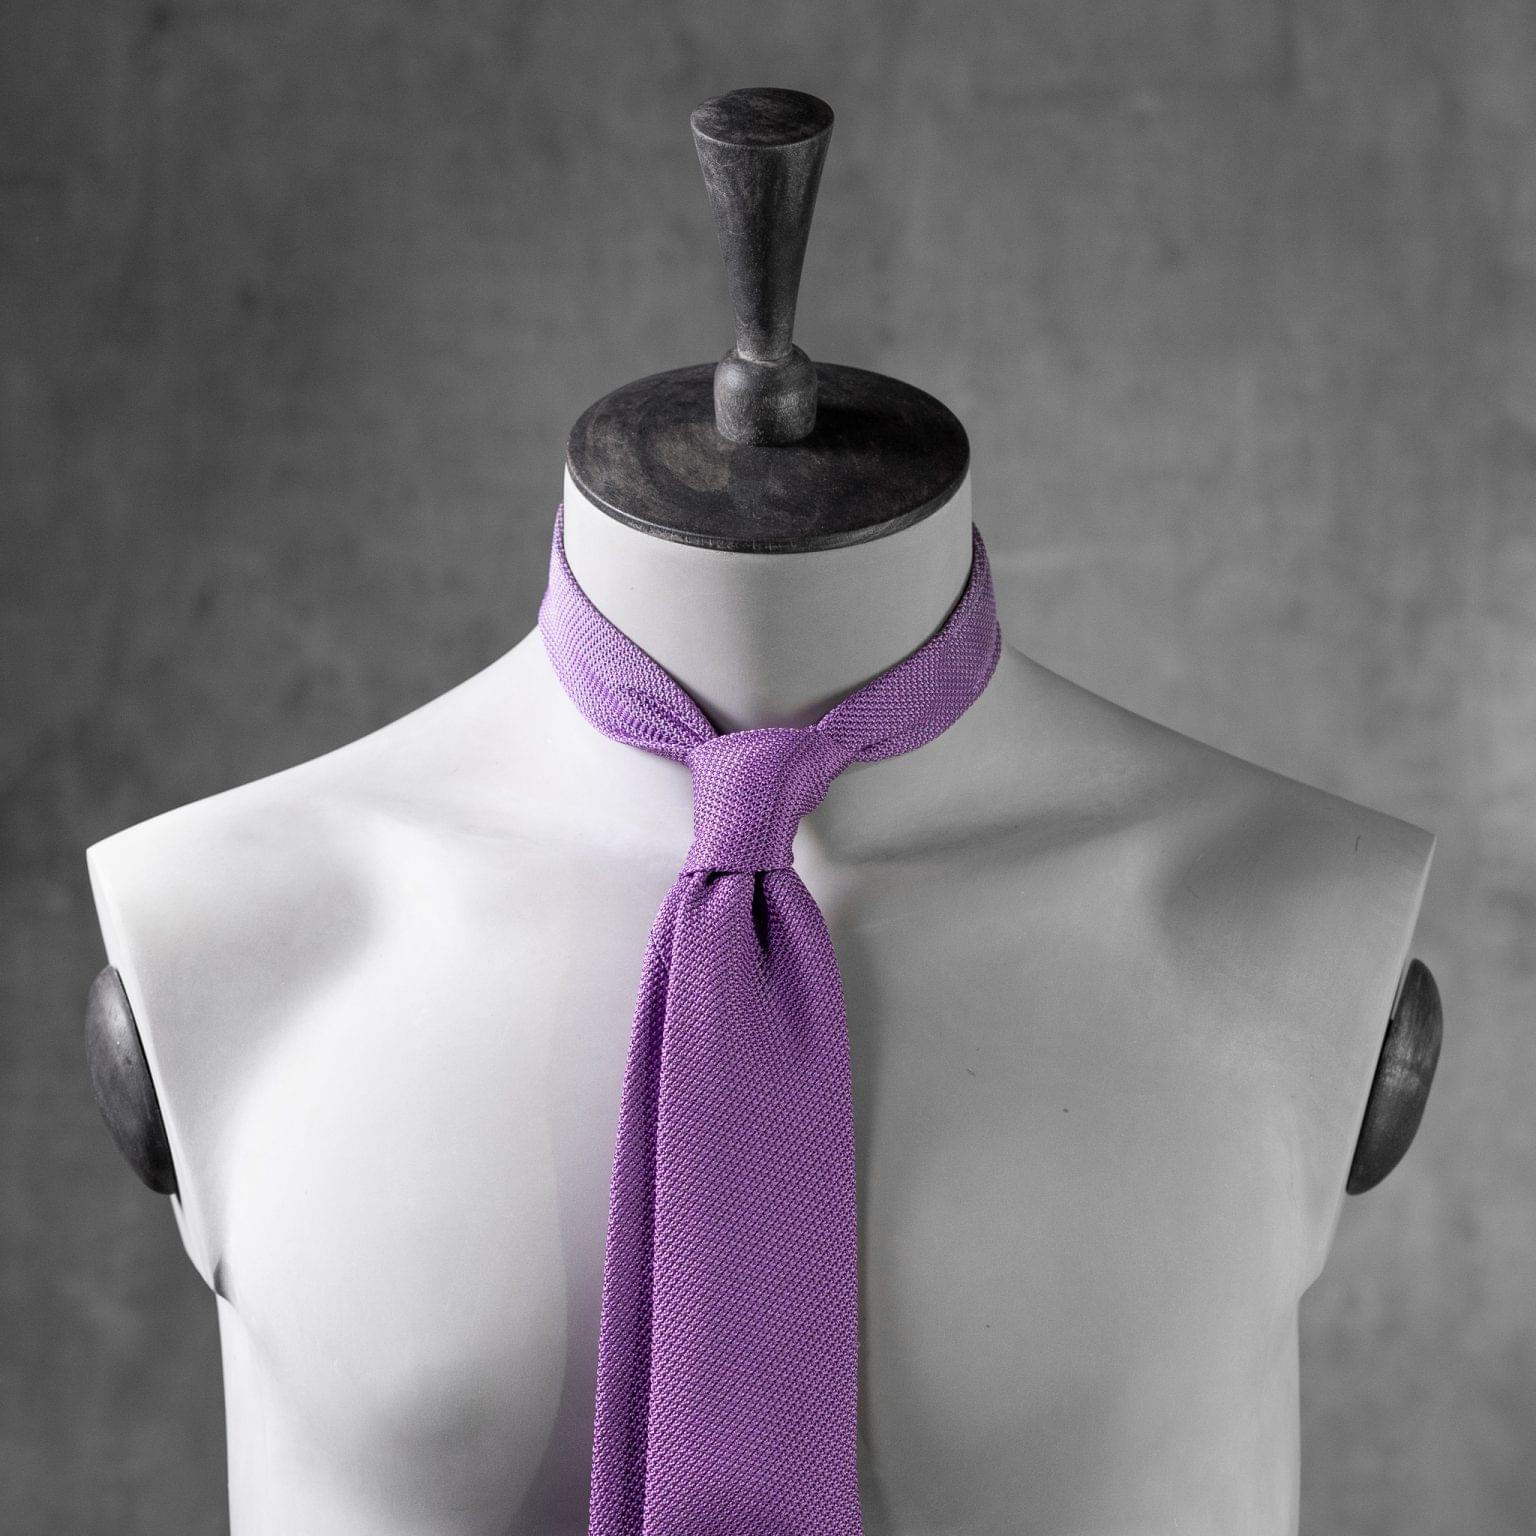 GRENADINE-0154-Tie-Initials-Corbata-Iniciales-The-Seelk-3